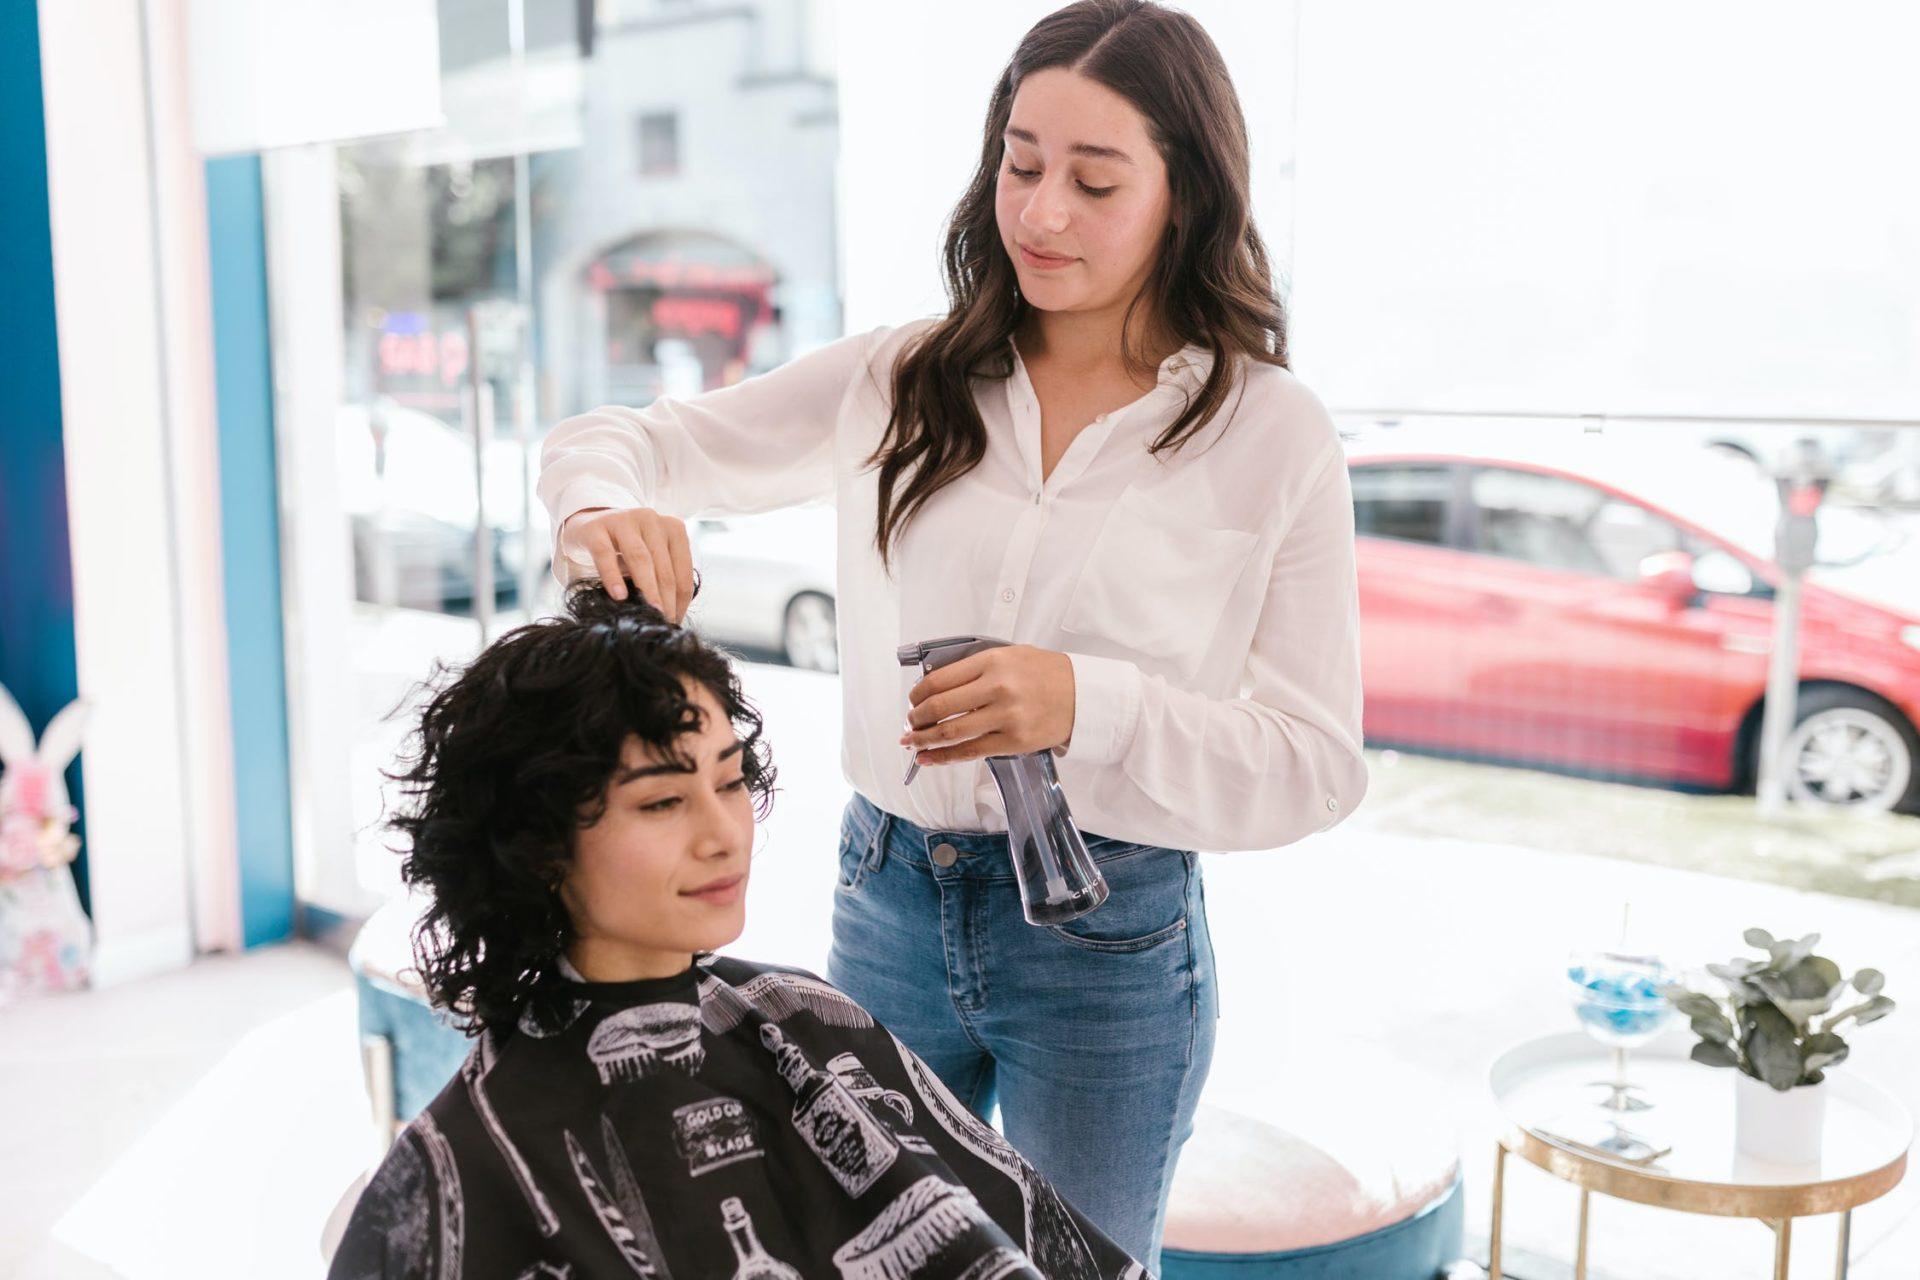 drying curly hair x2